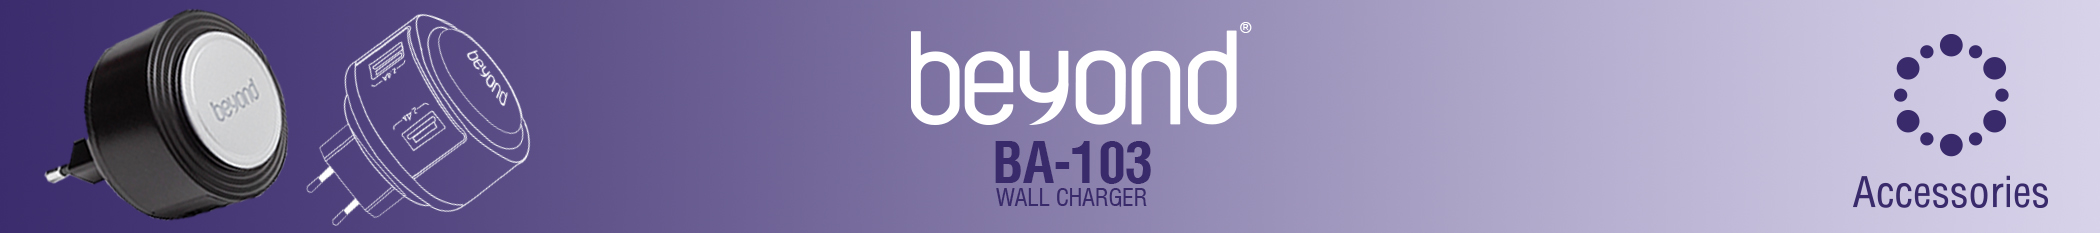 شارژر دیواری بیاند BA-103